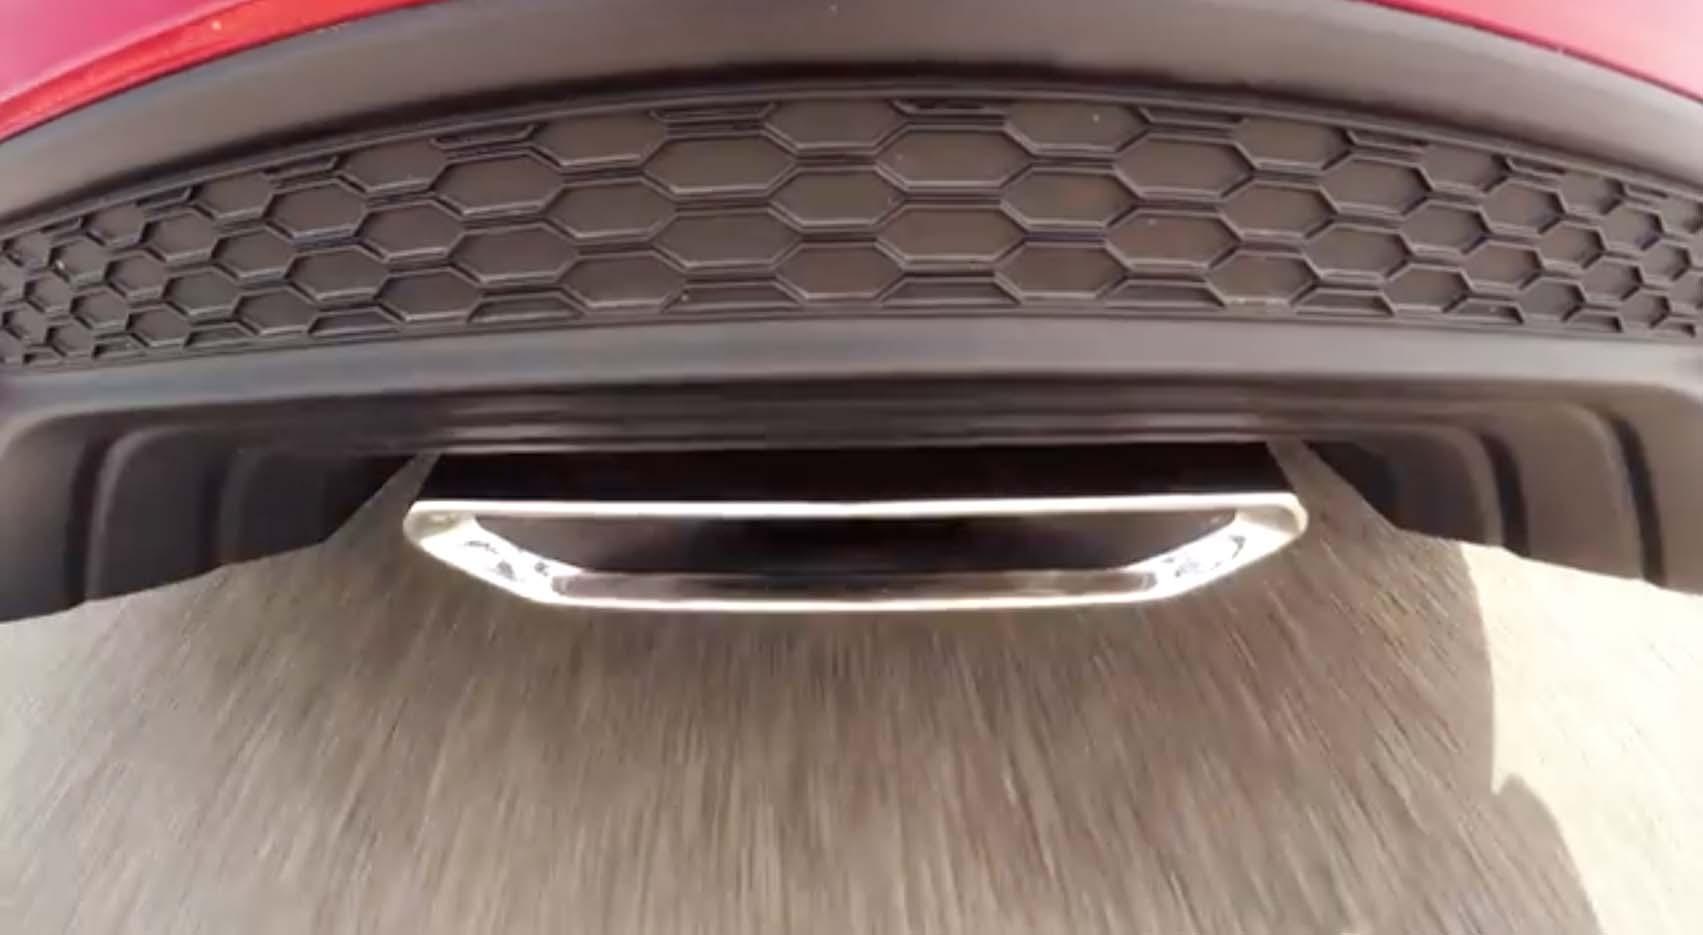 Honda Civic Si debutó en YouTube